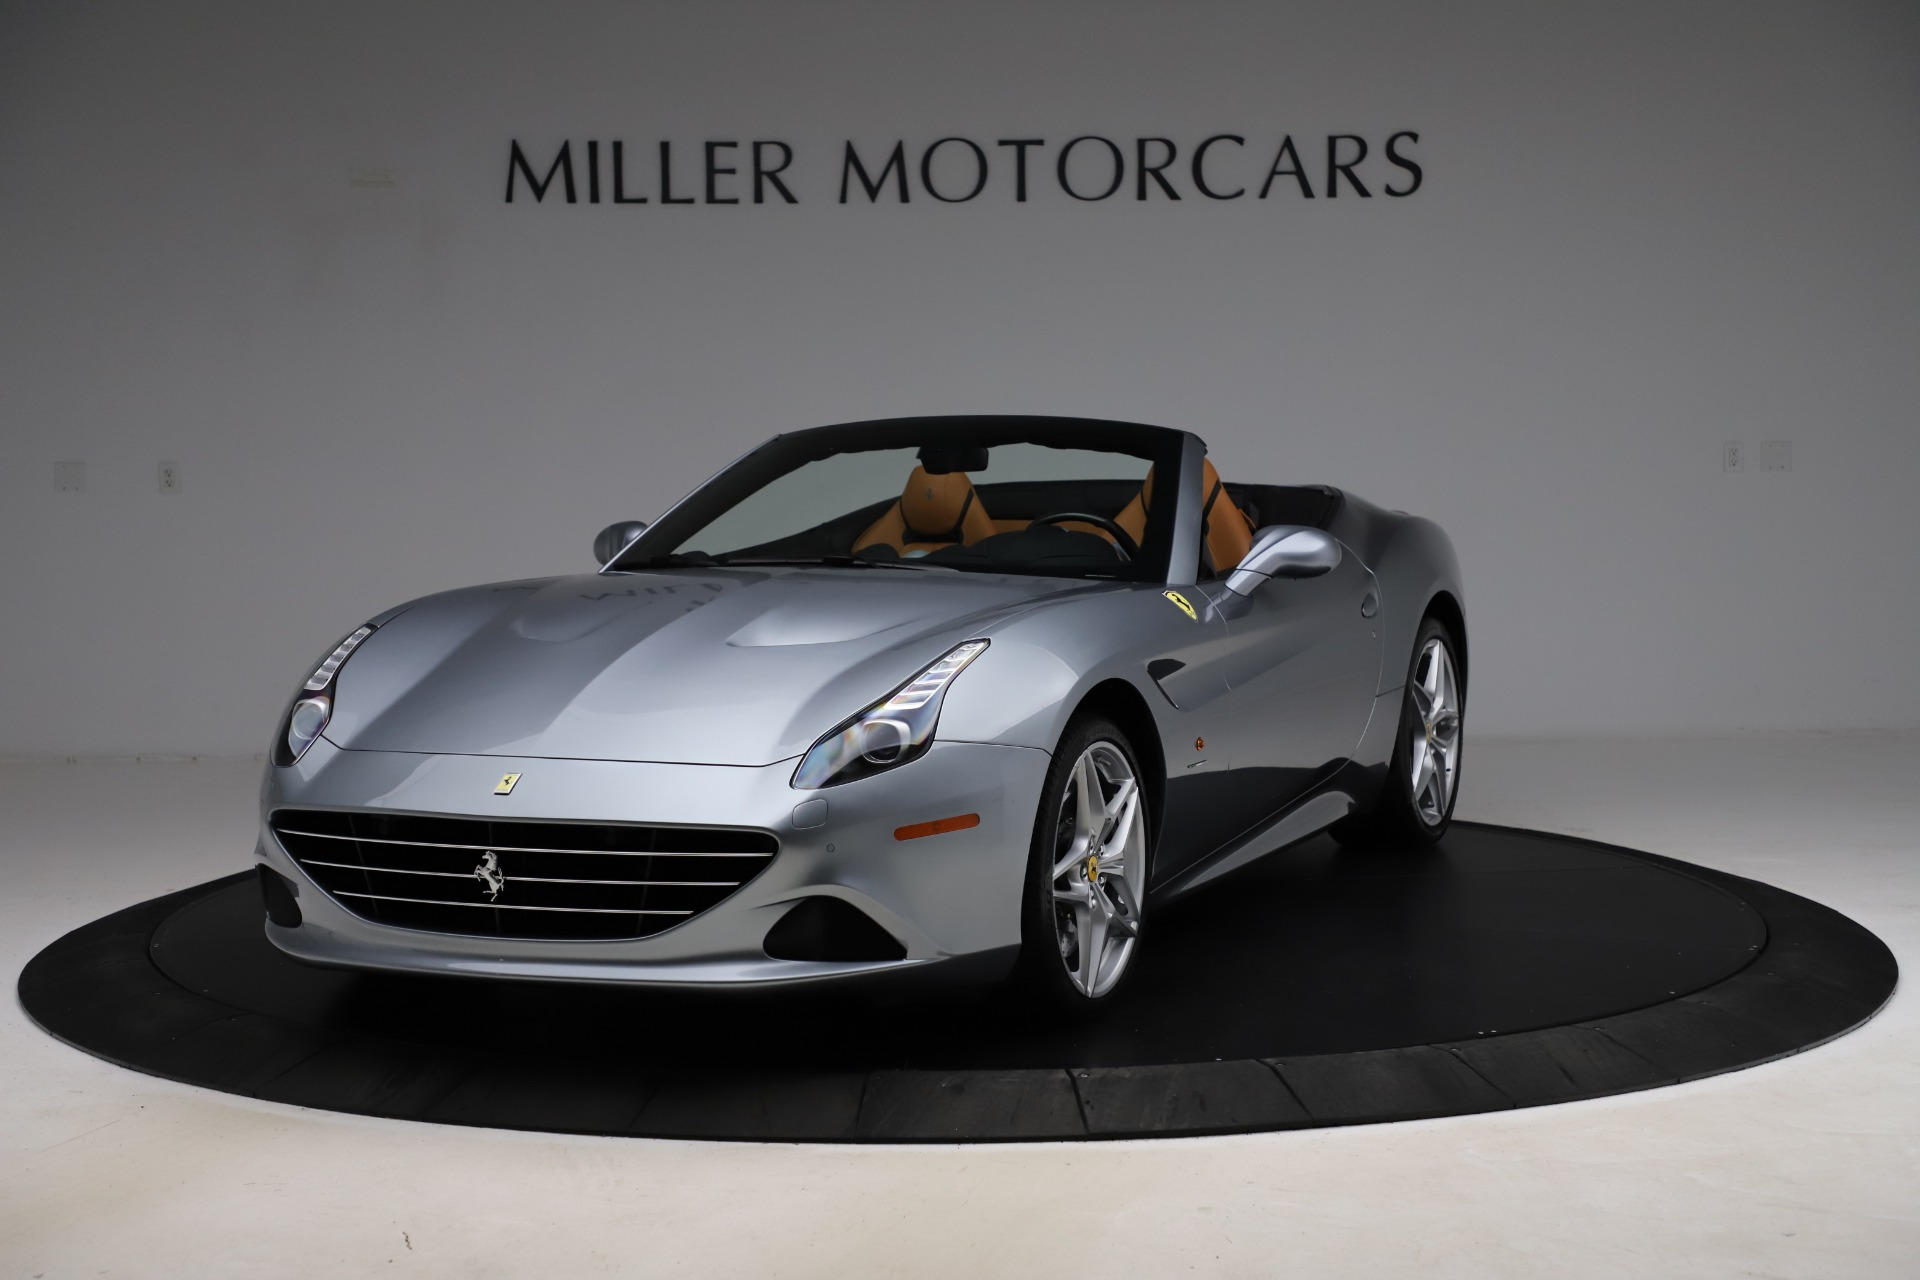 Used 2016 Ferrari California T for sale $157,900 at Aston Martin of Greenwich in Greenwich CT 06830 1